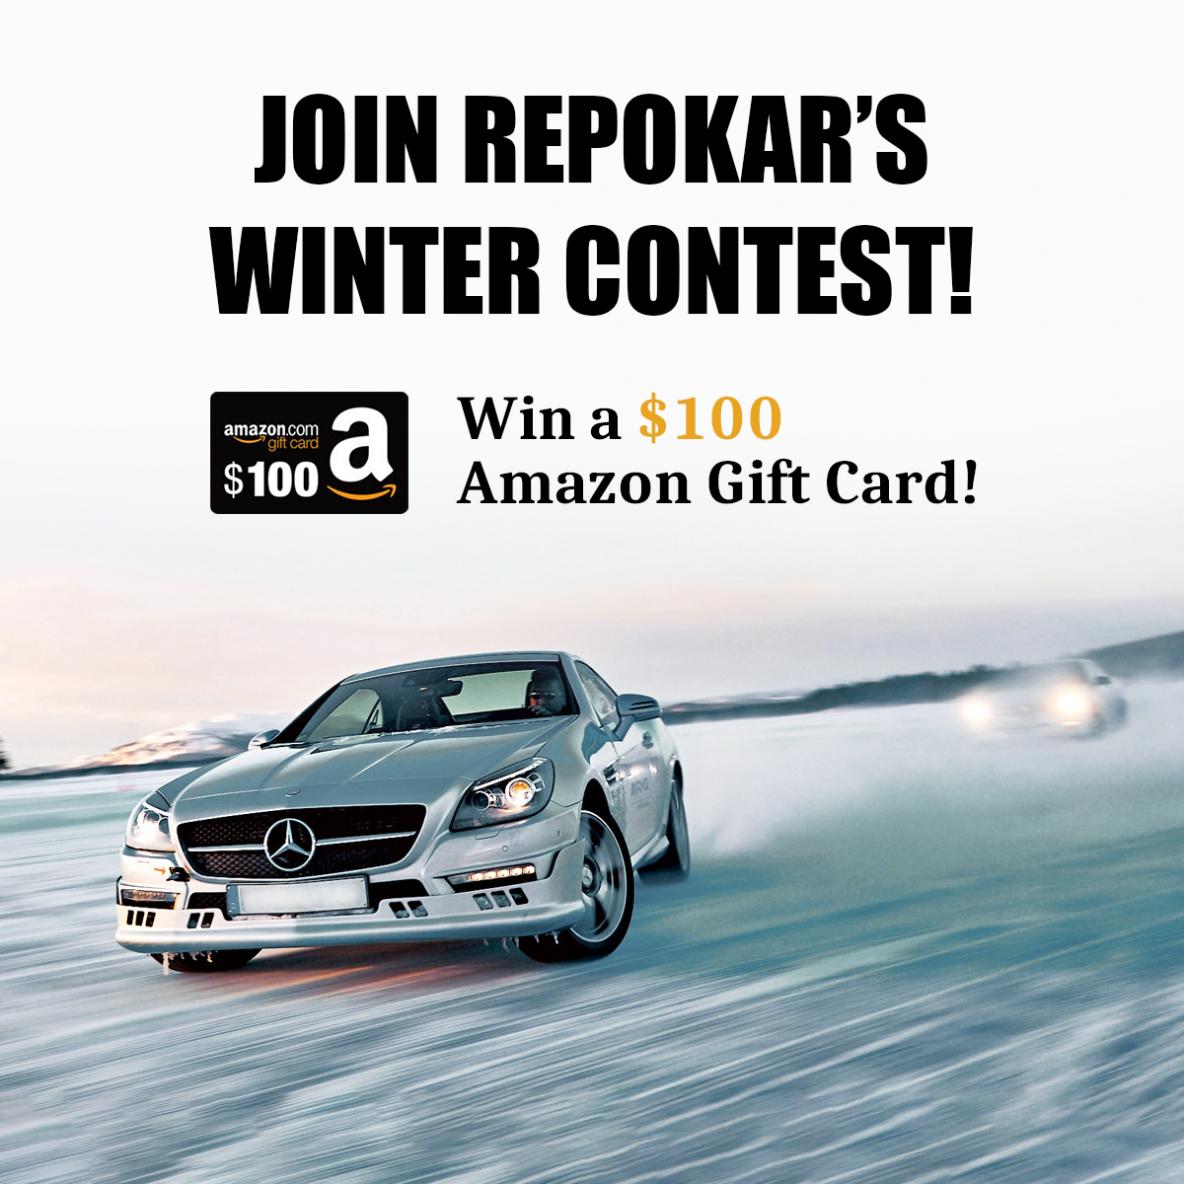 Win a $100.00 Amazon Gift Card with RepoKar